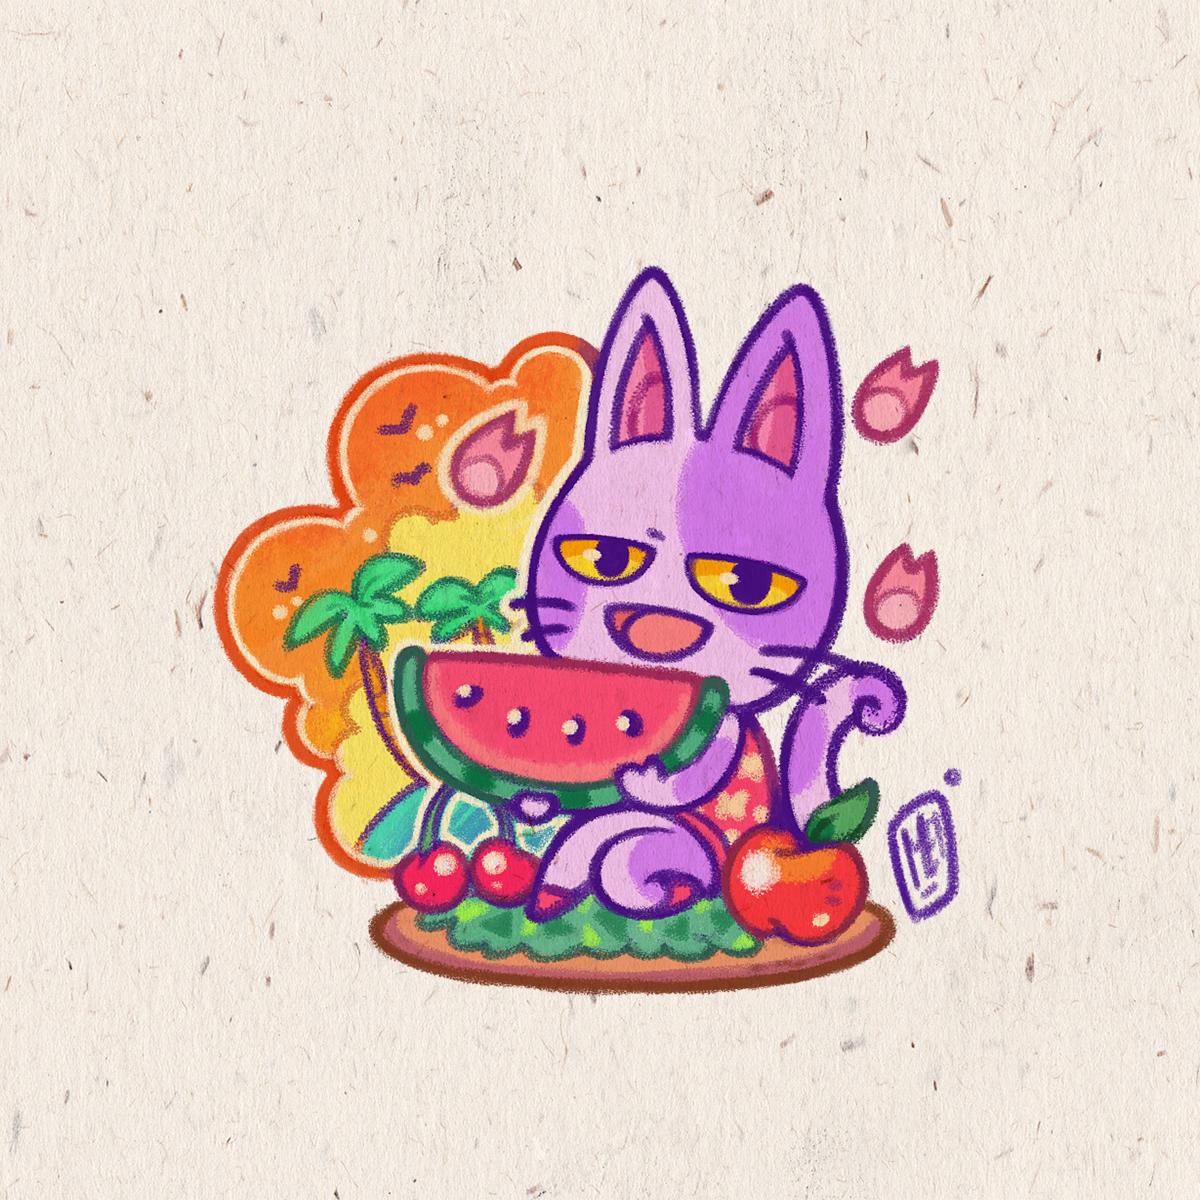 Mei Serenade Illustration Jw Valencia On Twitter Bob The Cat